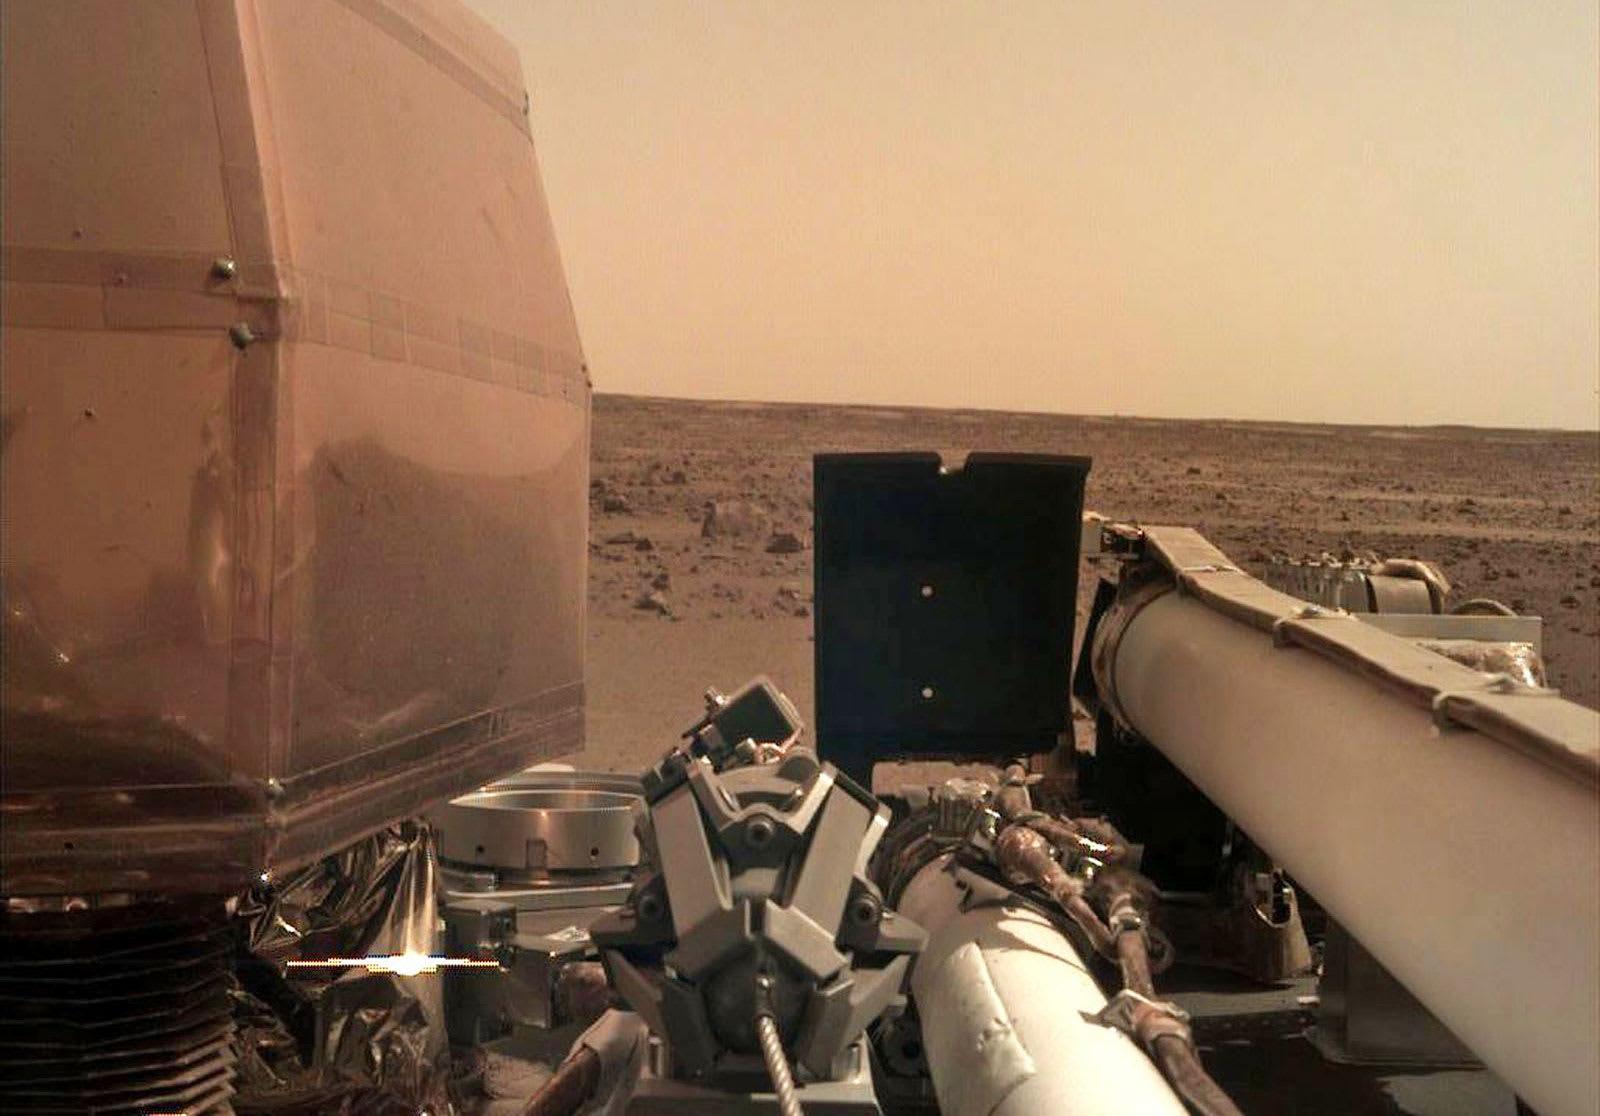 nasa mars landing photo - photo #17